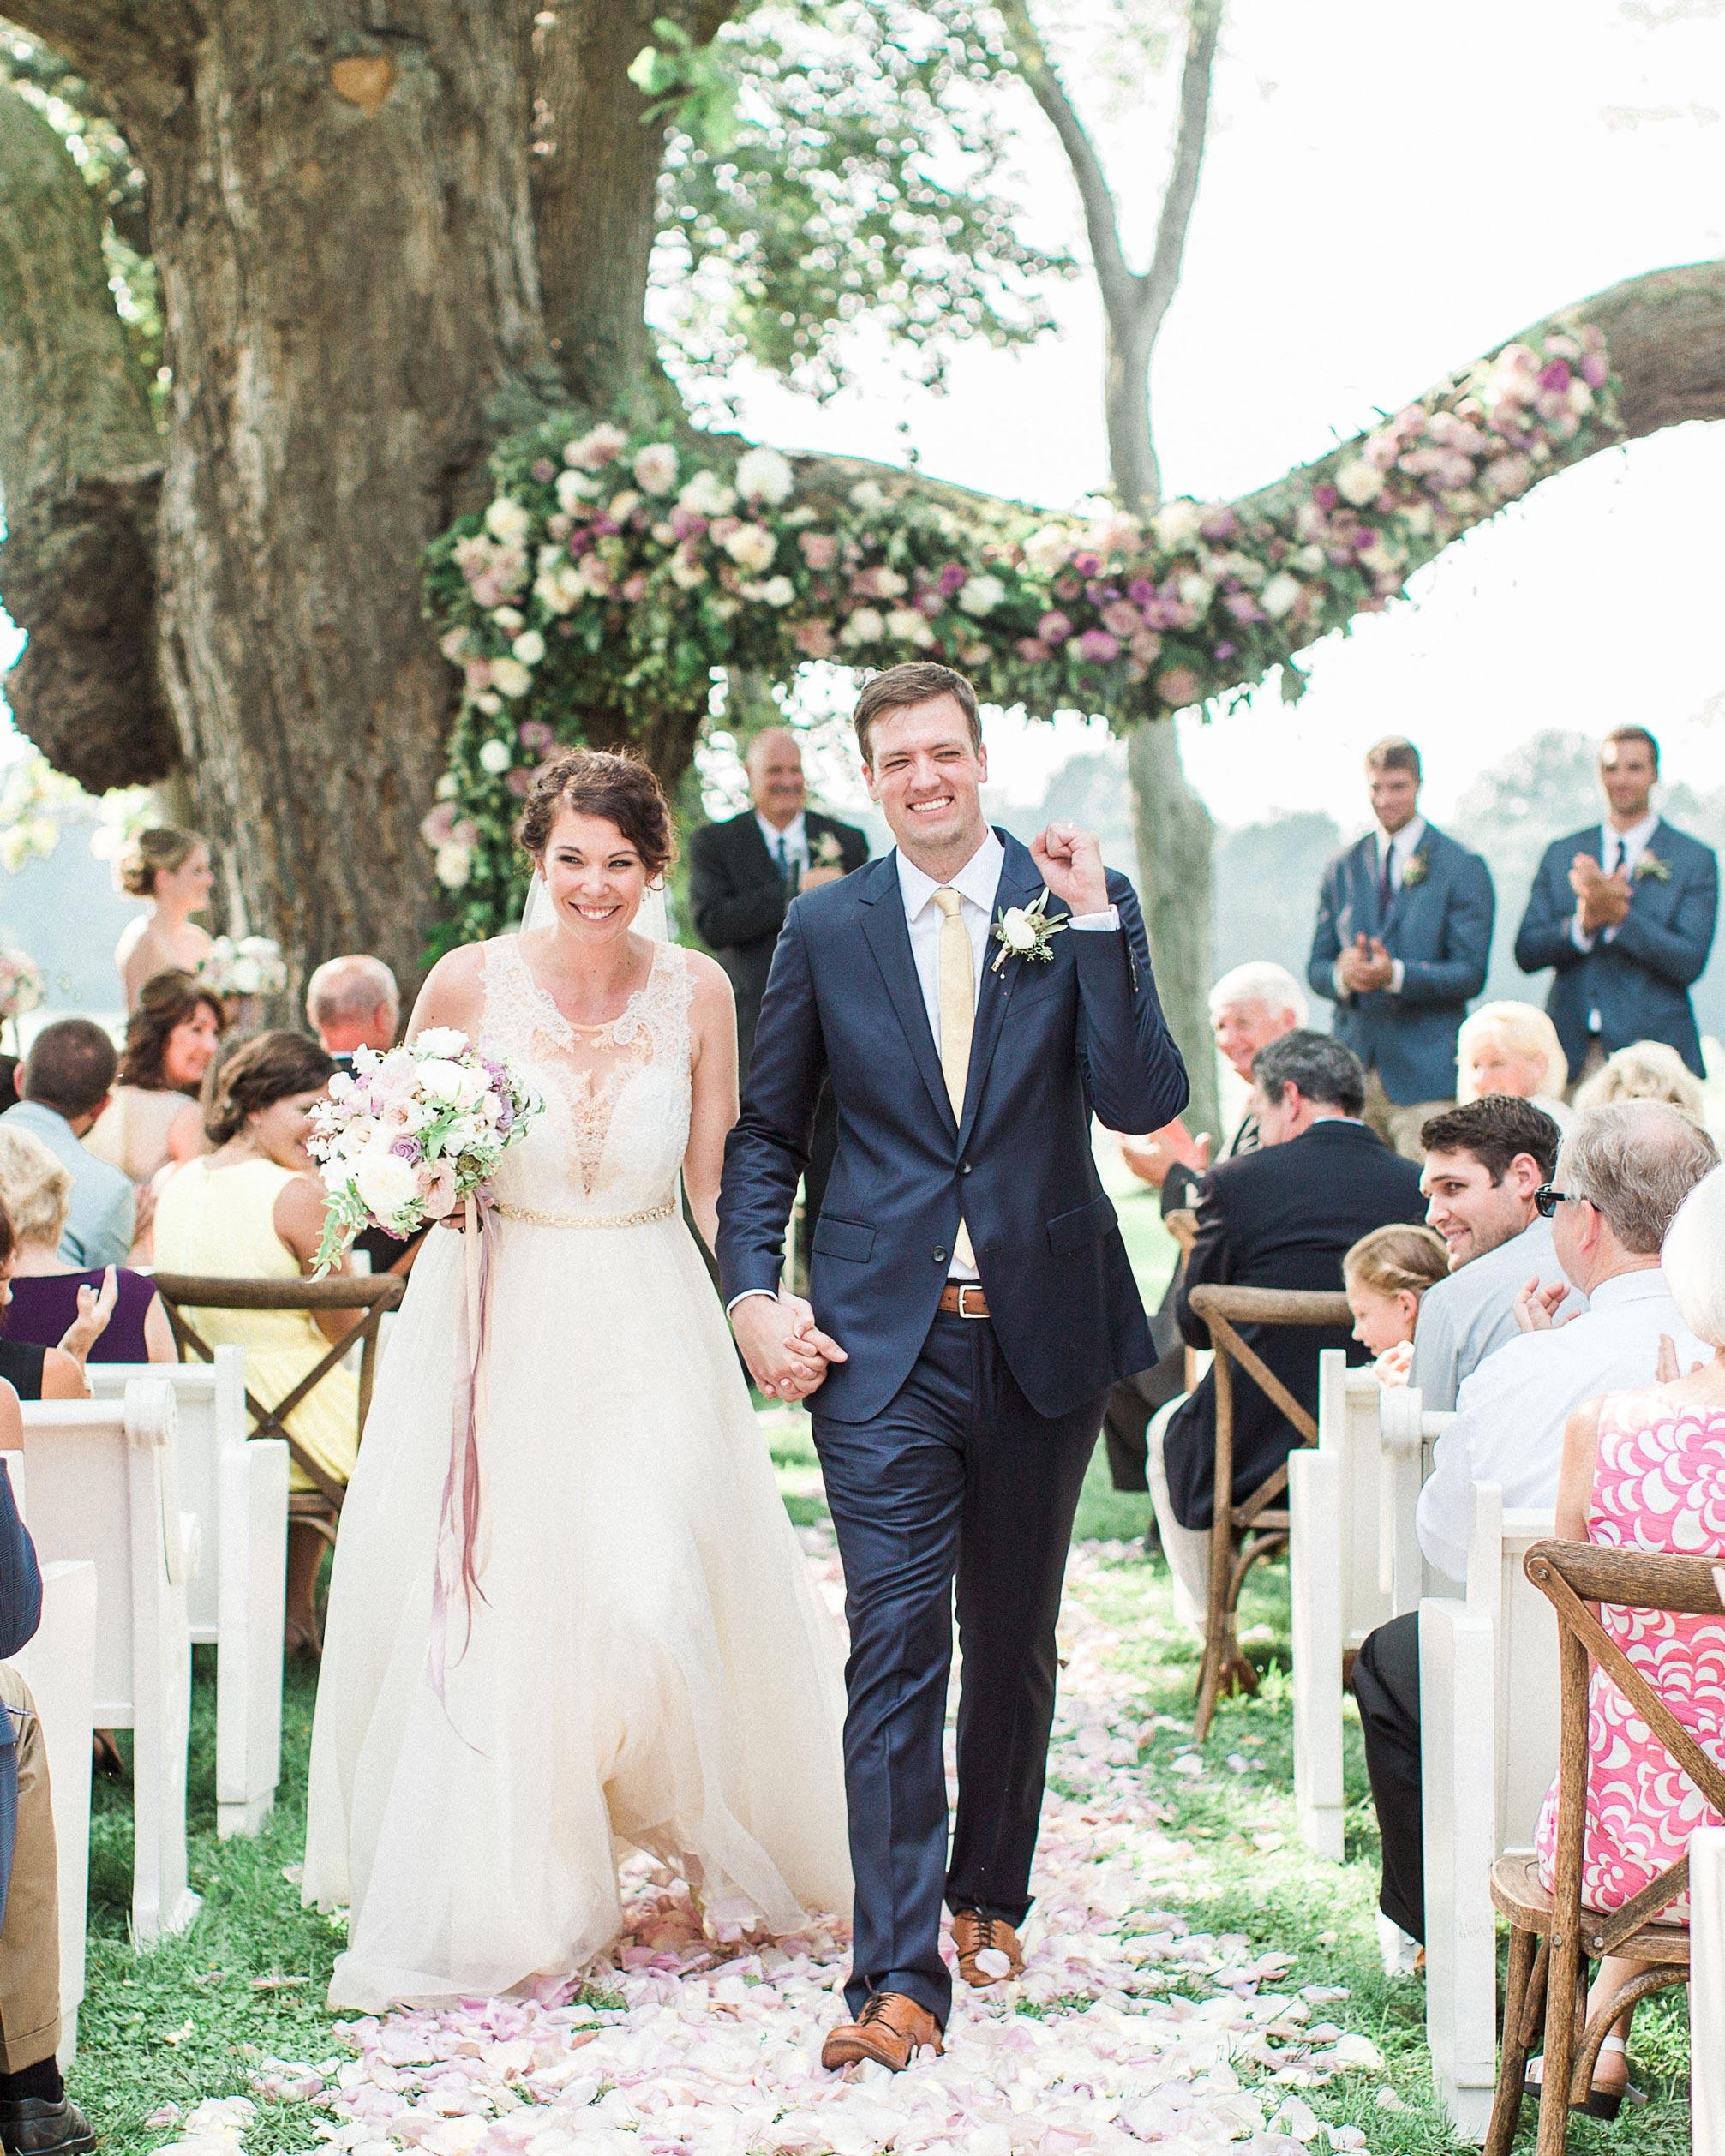 sarah-michael-wedding-recessional-595-s112783-0416.jpg